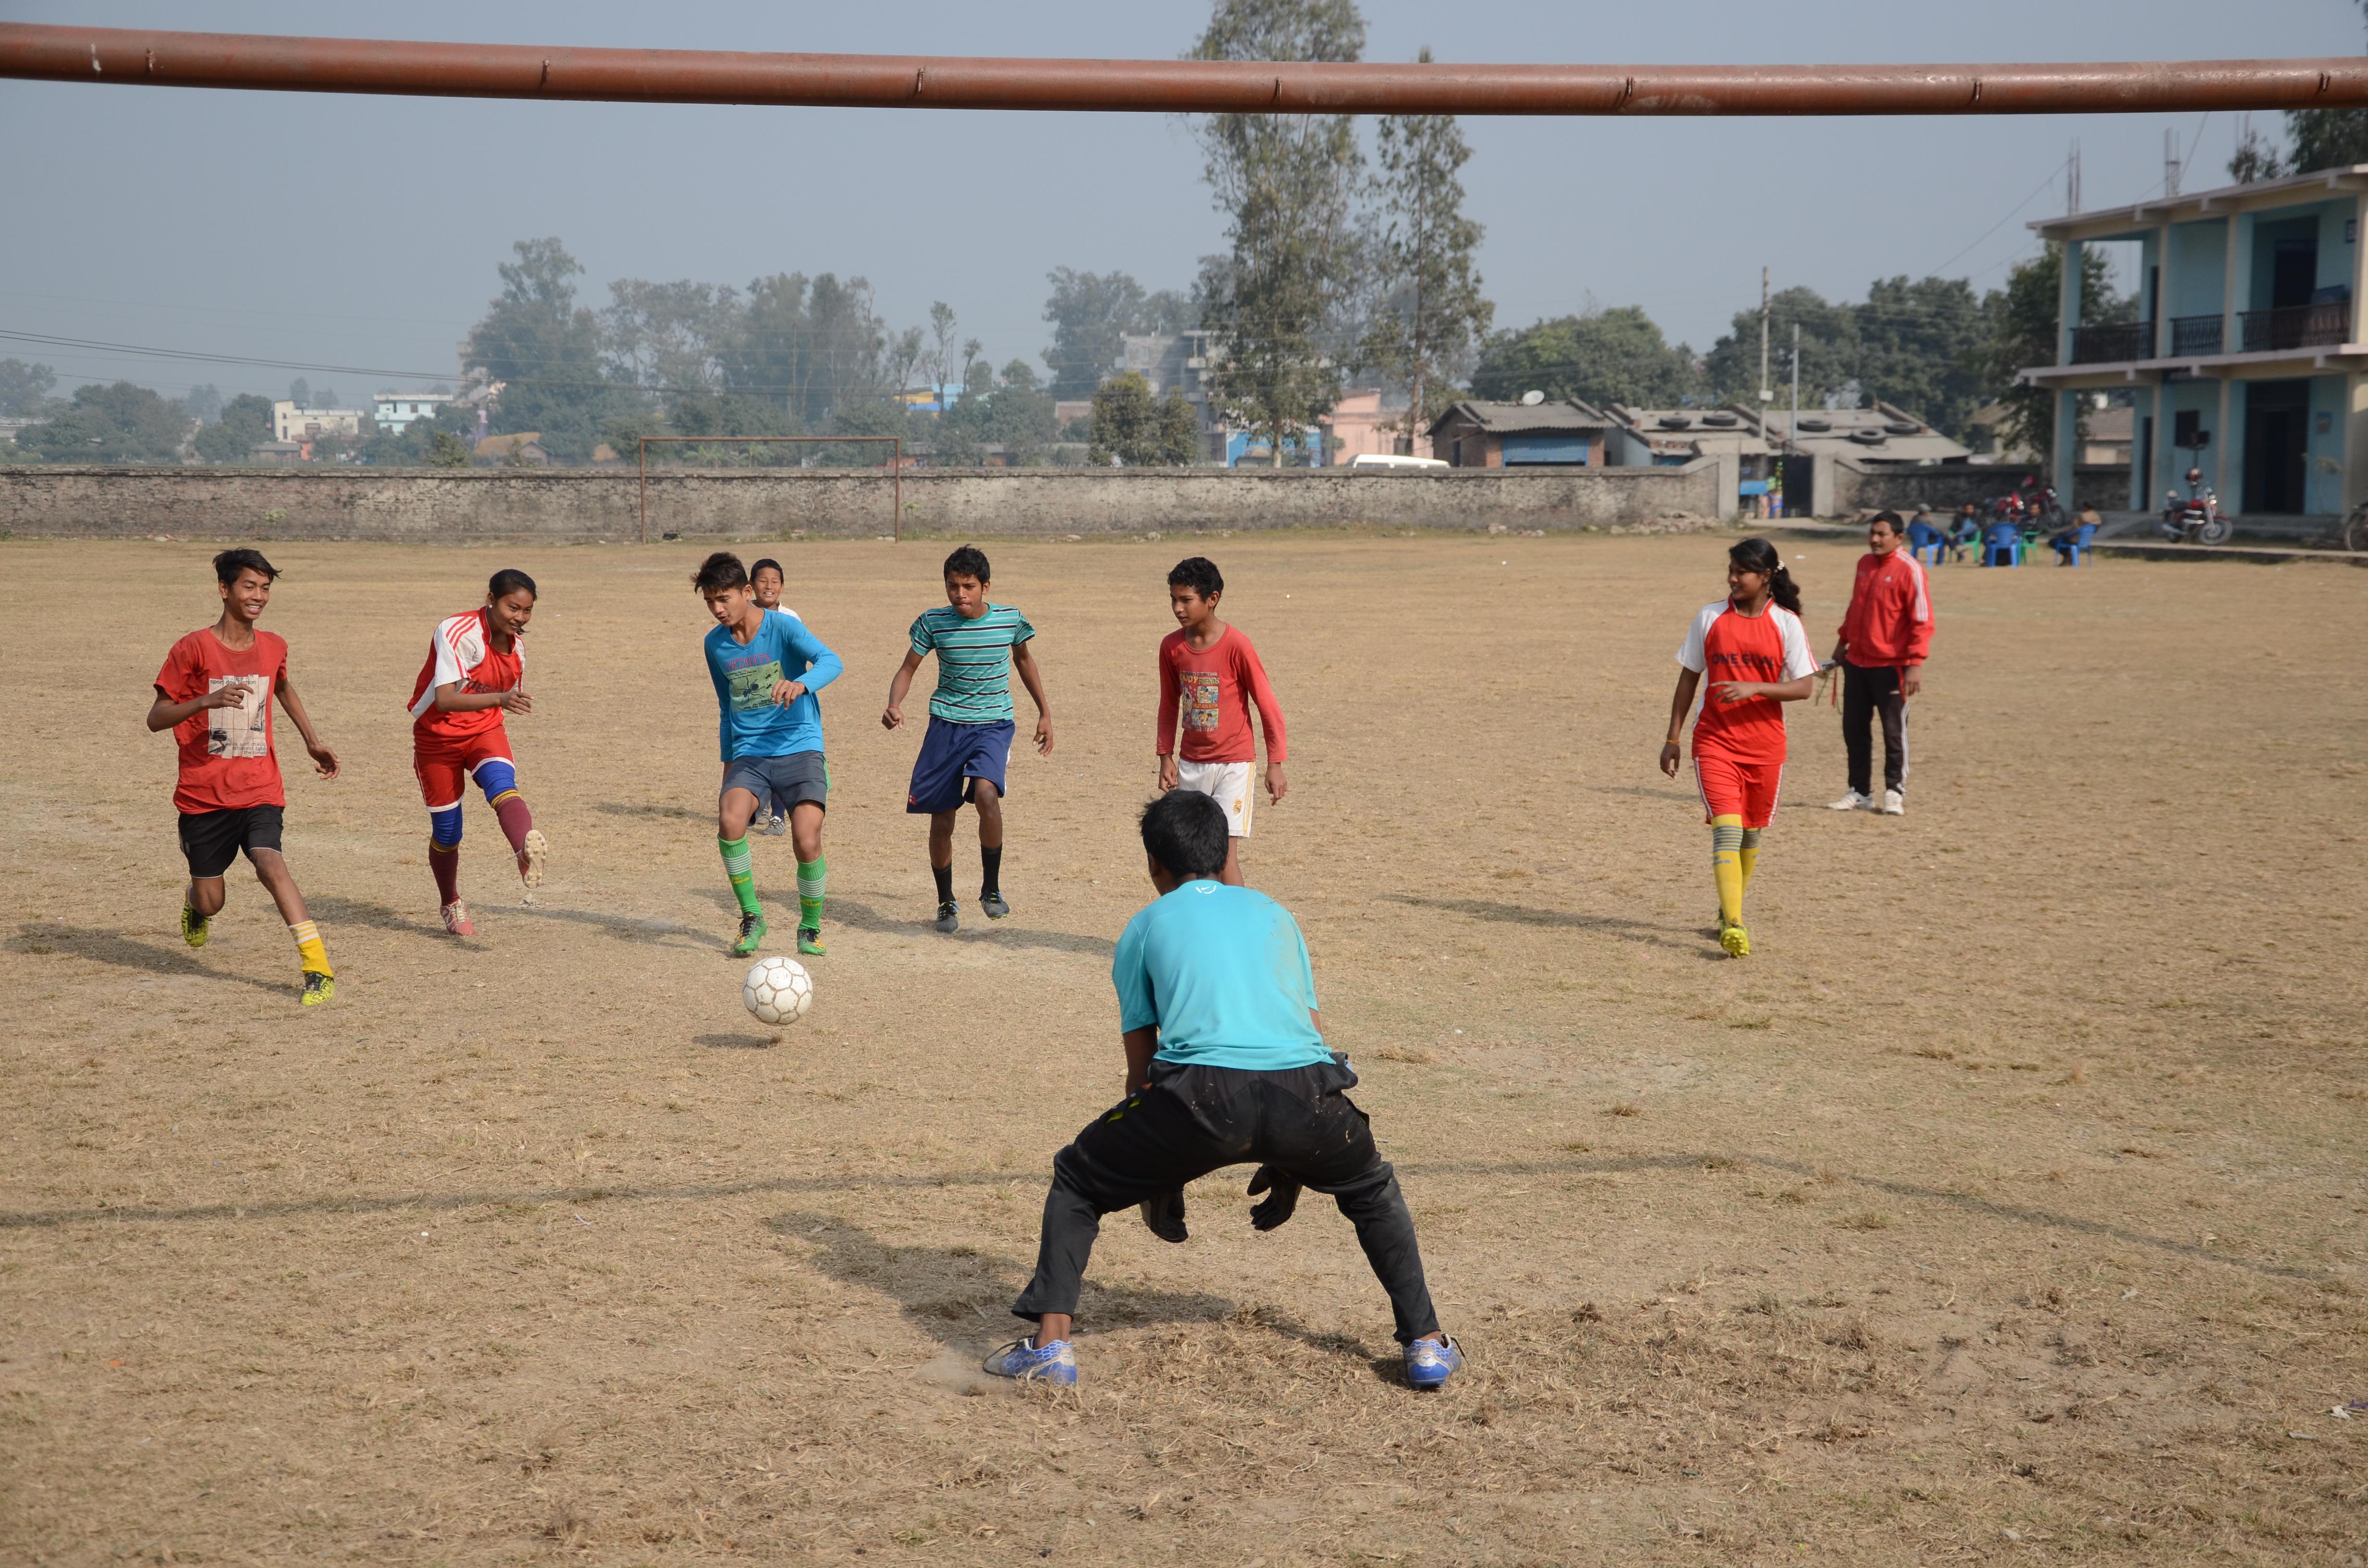 s151194_10_Sumina_Nepal_SKunwar_(5)_720369.JPG